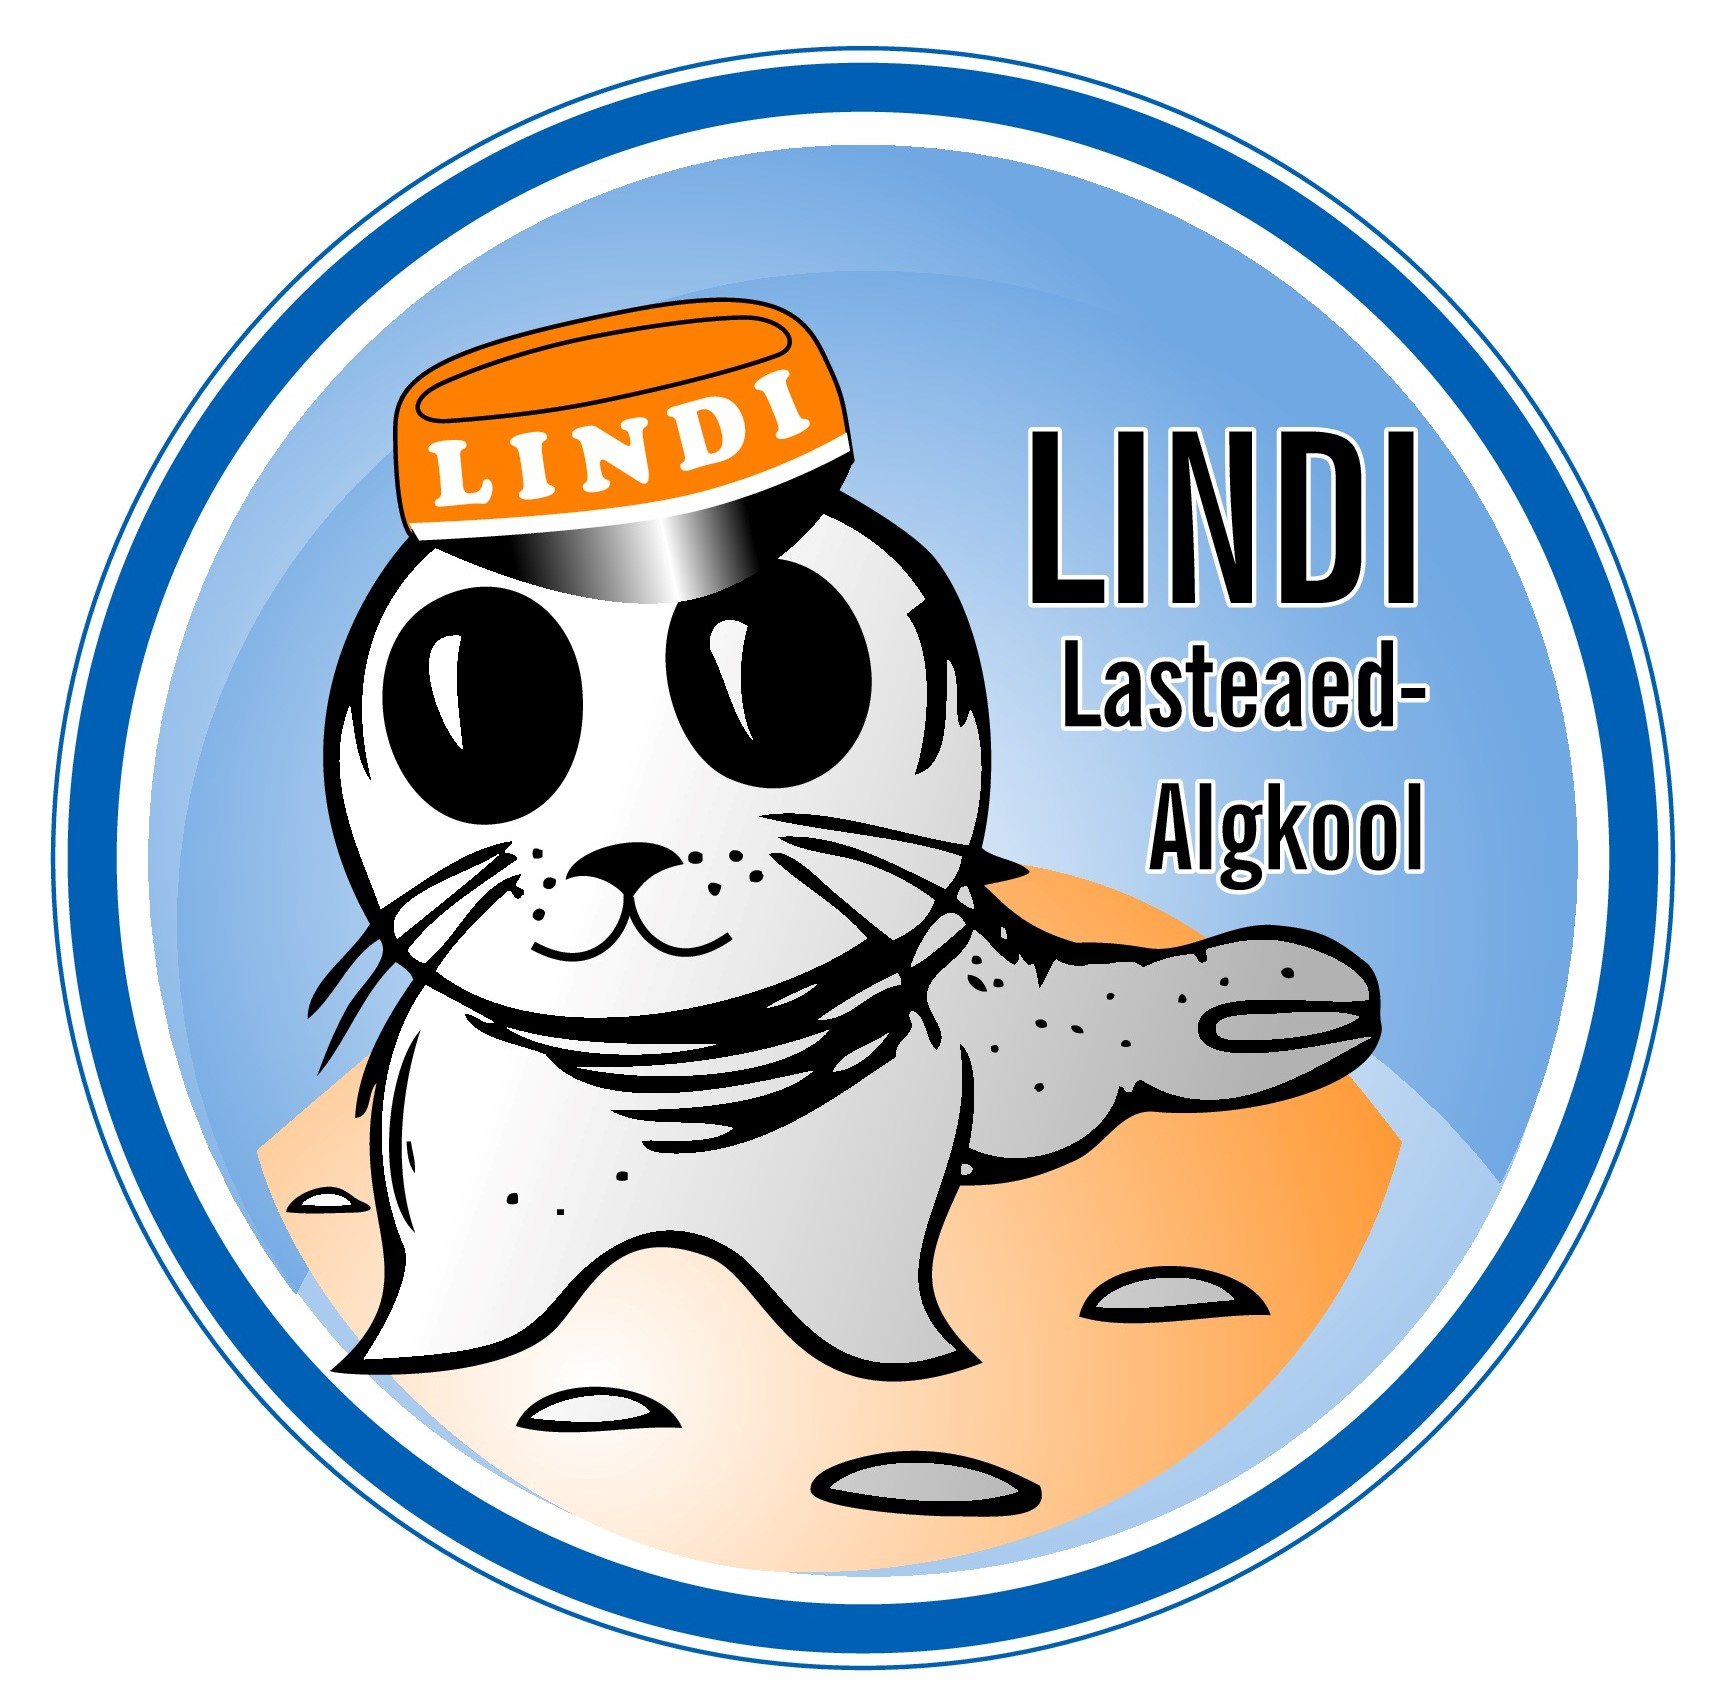 lindi-logo.jpg